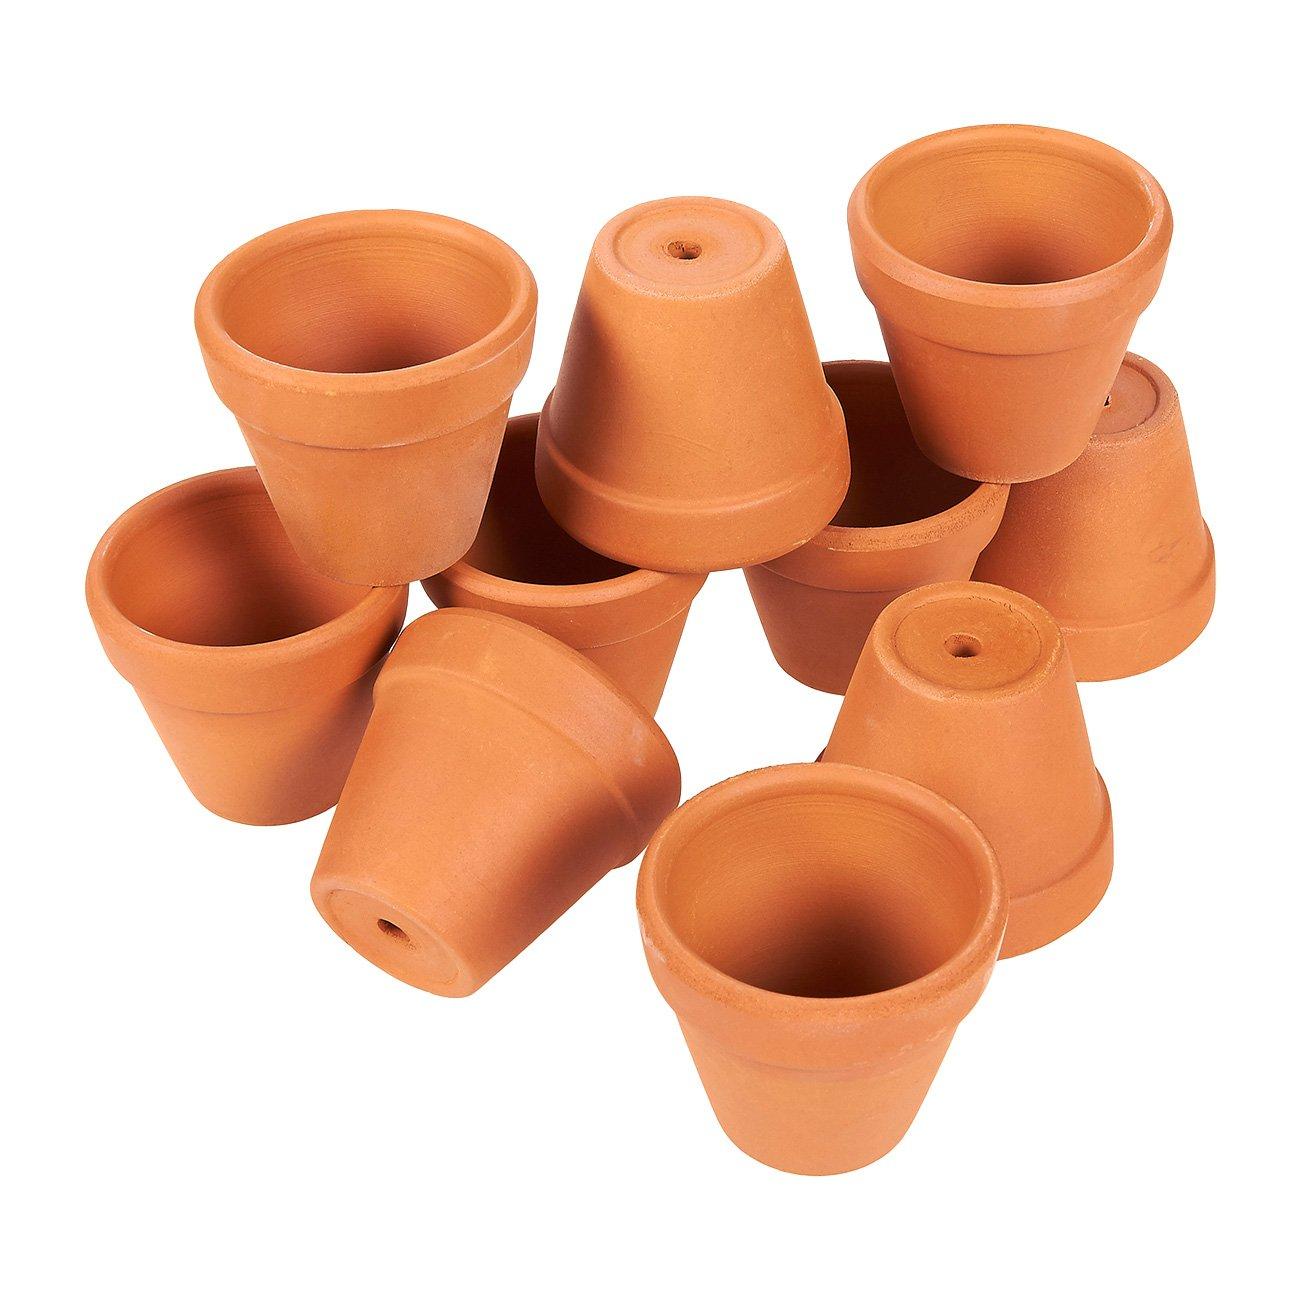 Juvale Mini Terracotta Pots 2 Inch Set of 10